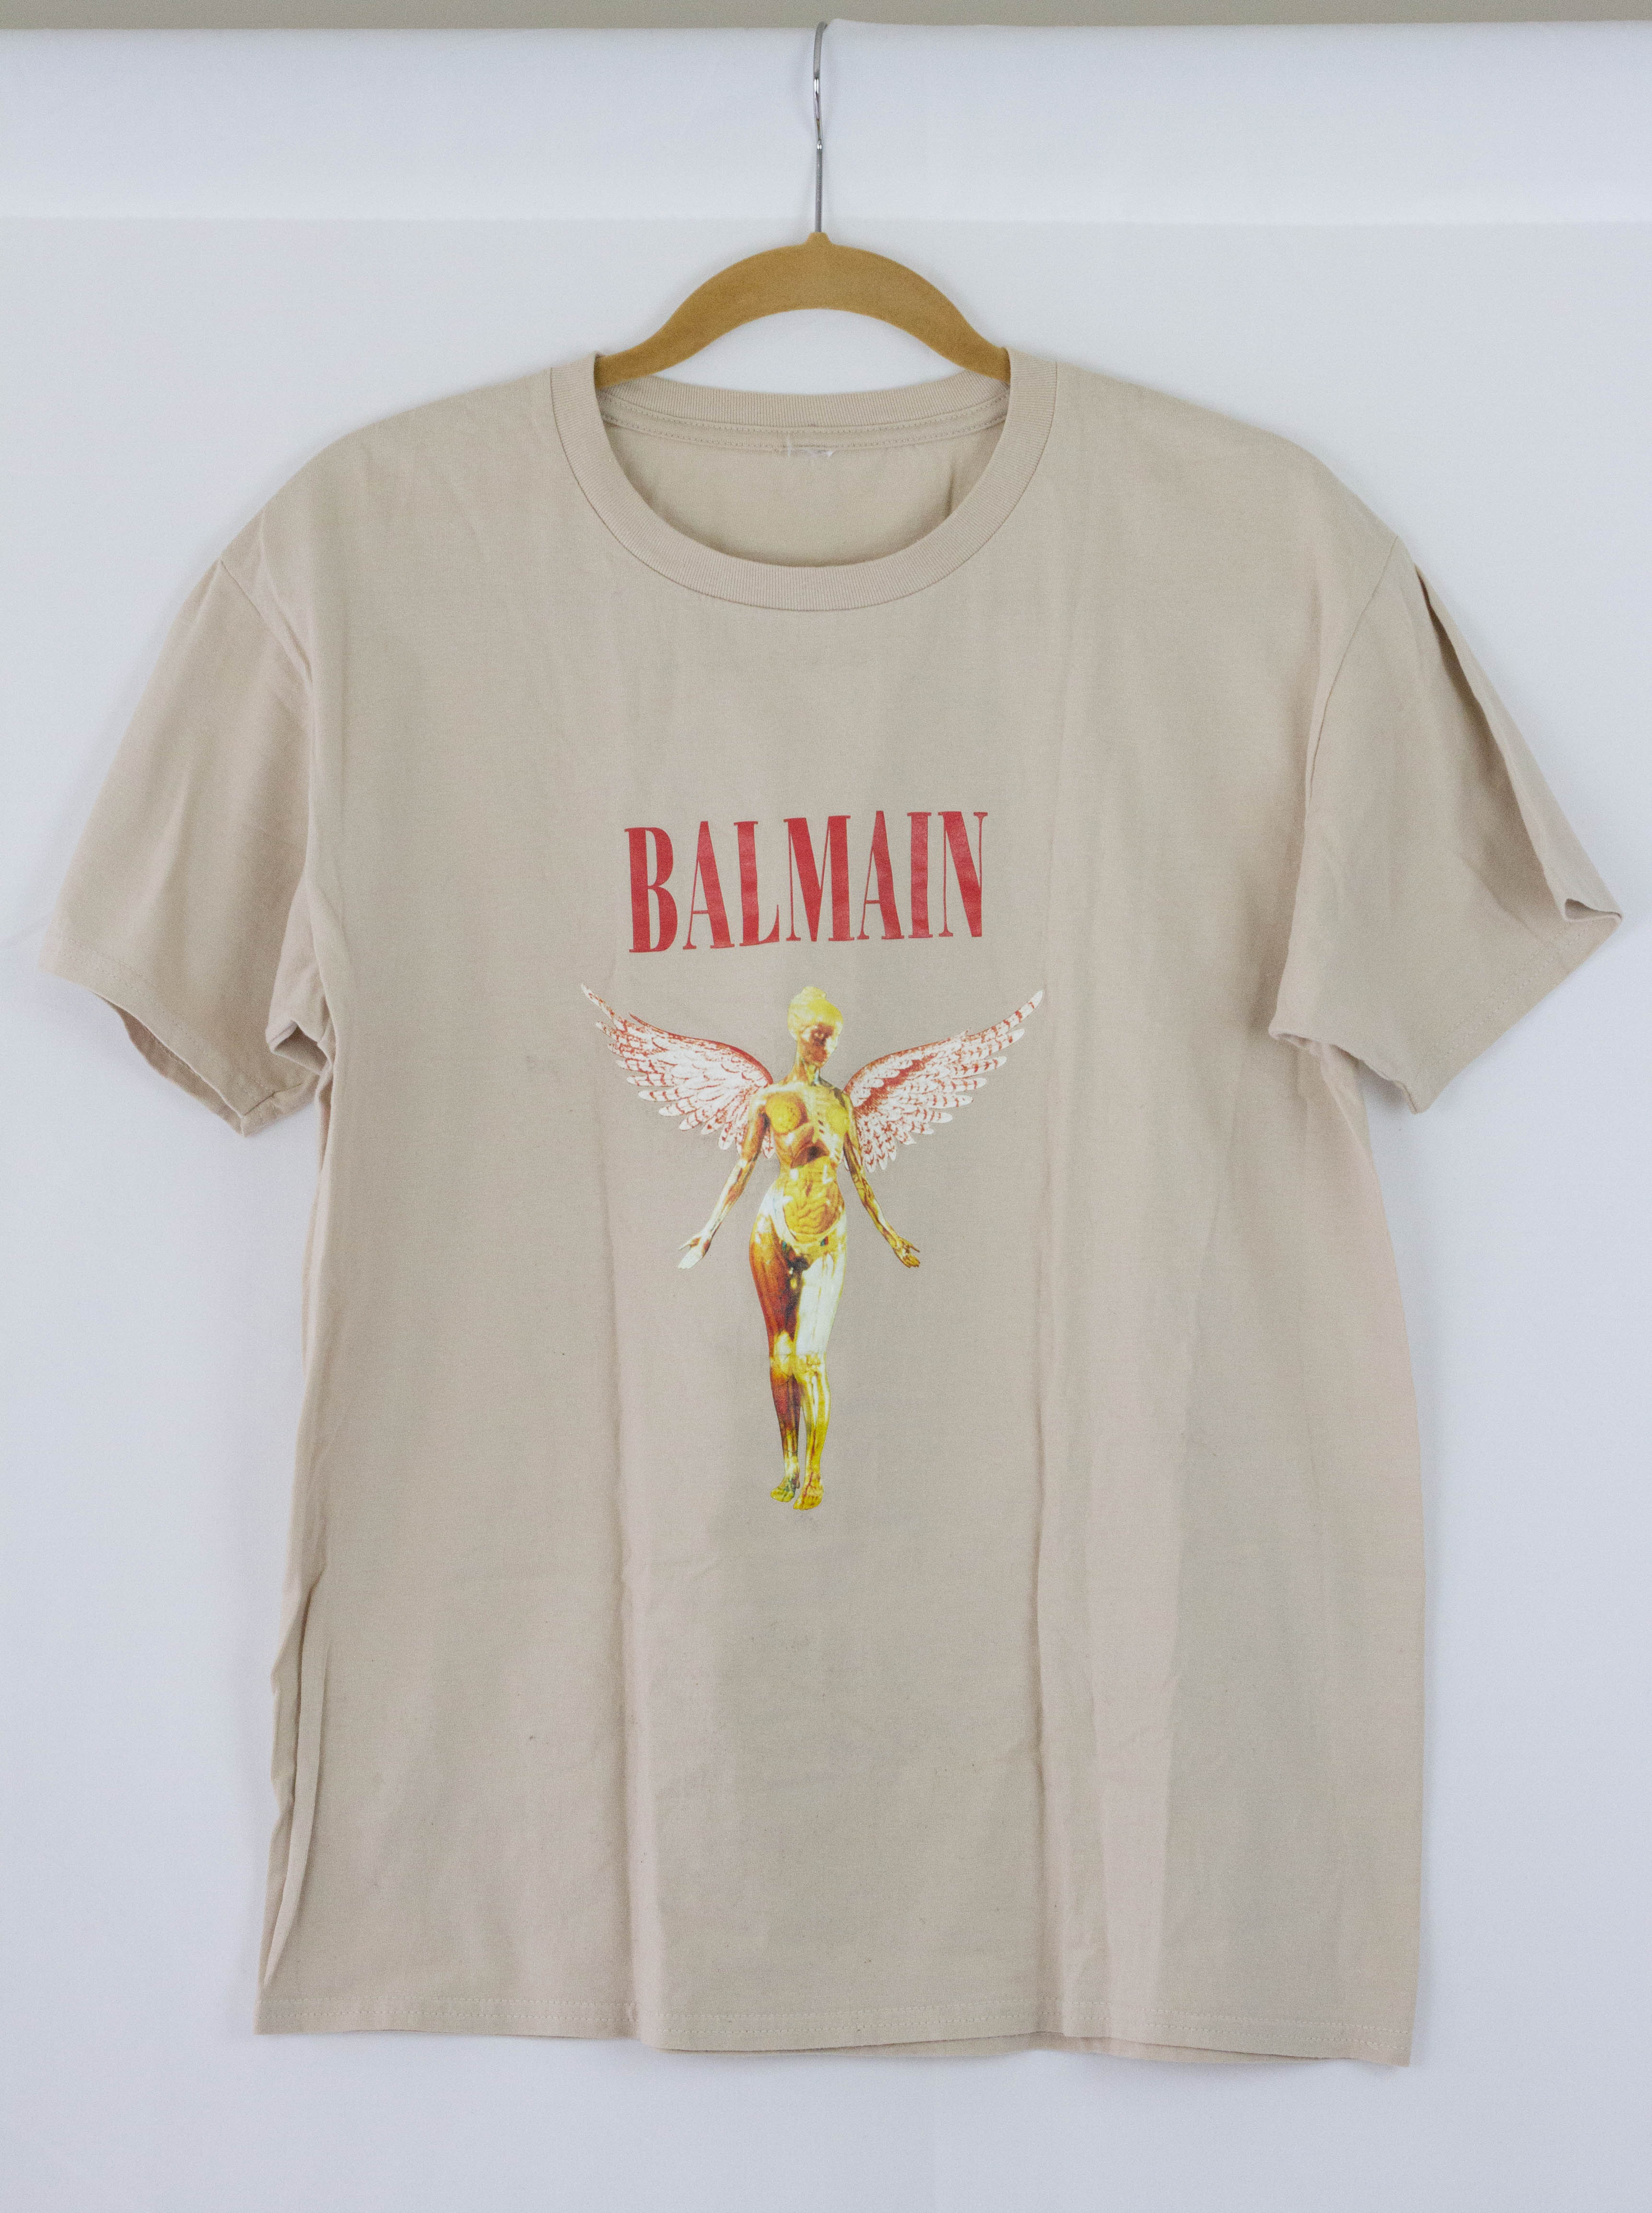 96a3a41c Balmain Nirvana X Balmain Mashup World Tour 1993 Tee Beige Fromthe ...